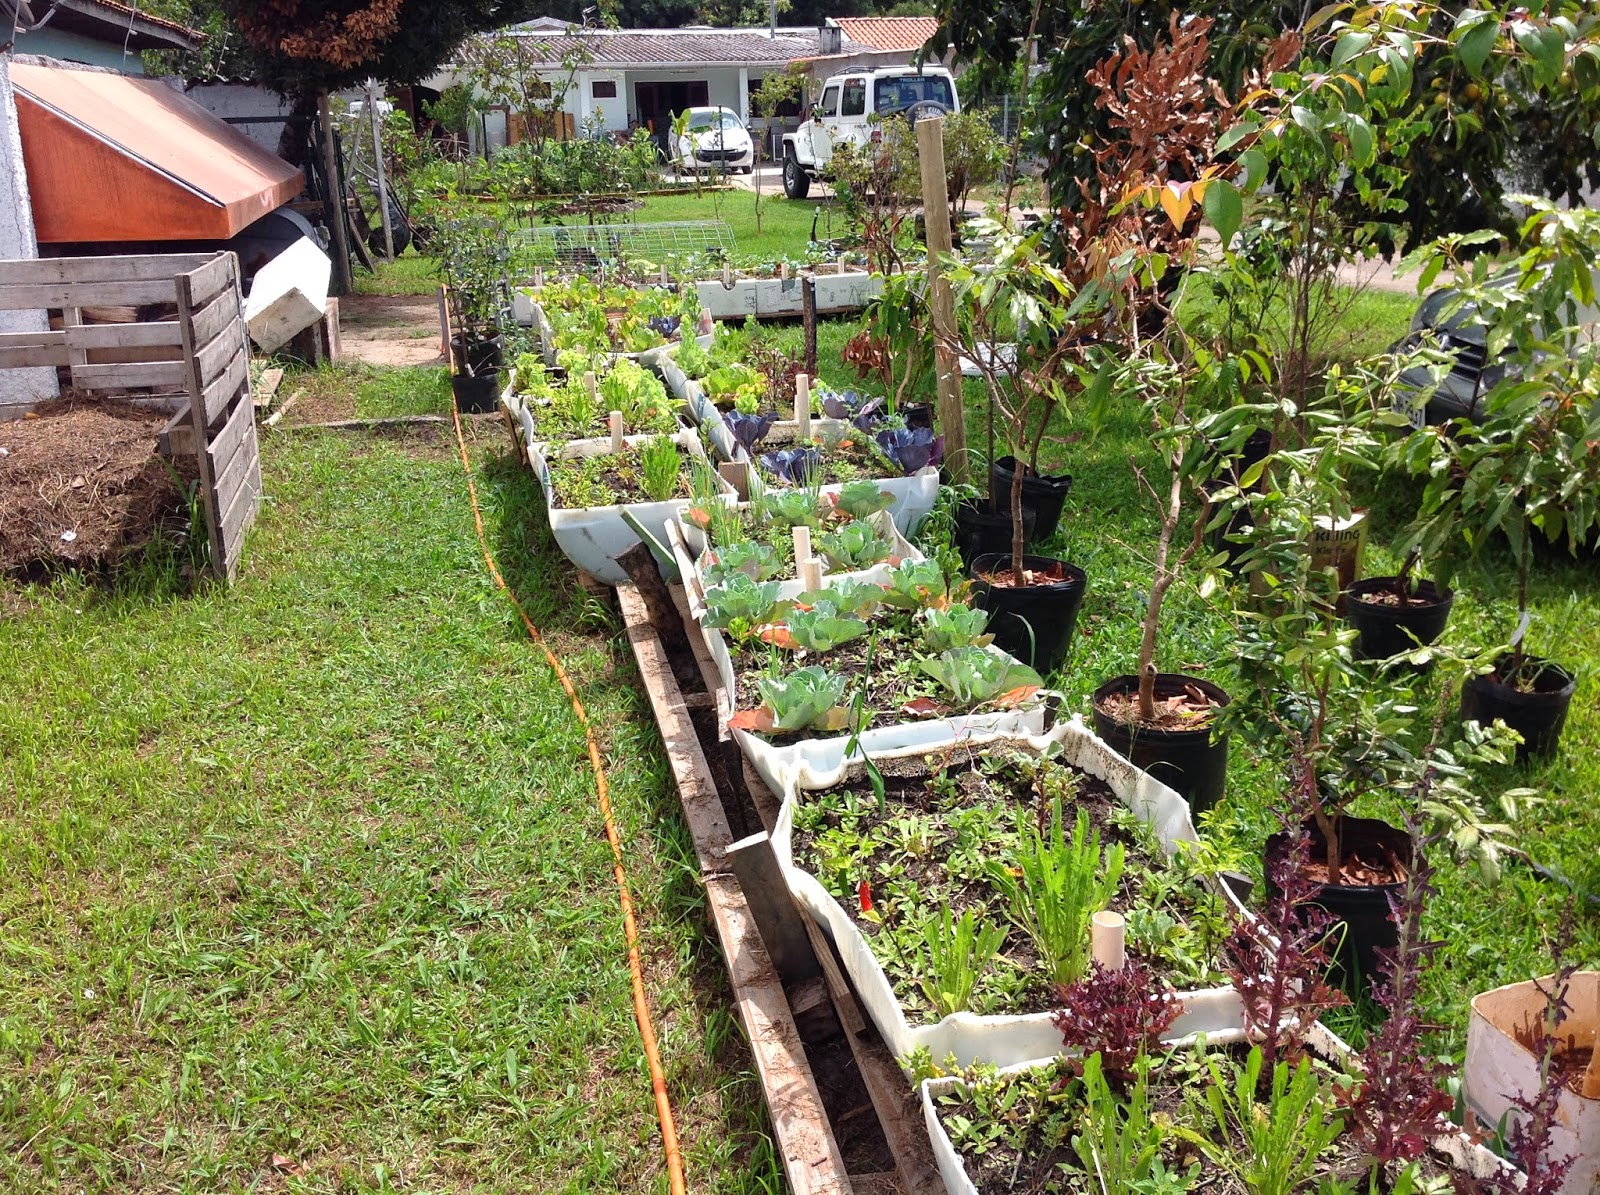 os-beneficios-da-permacultura-sustentavel-blog-usenatureza